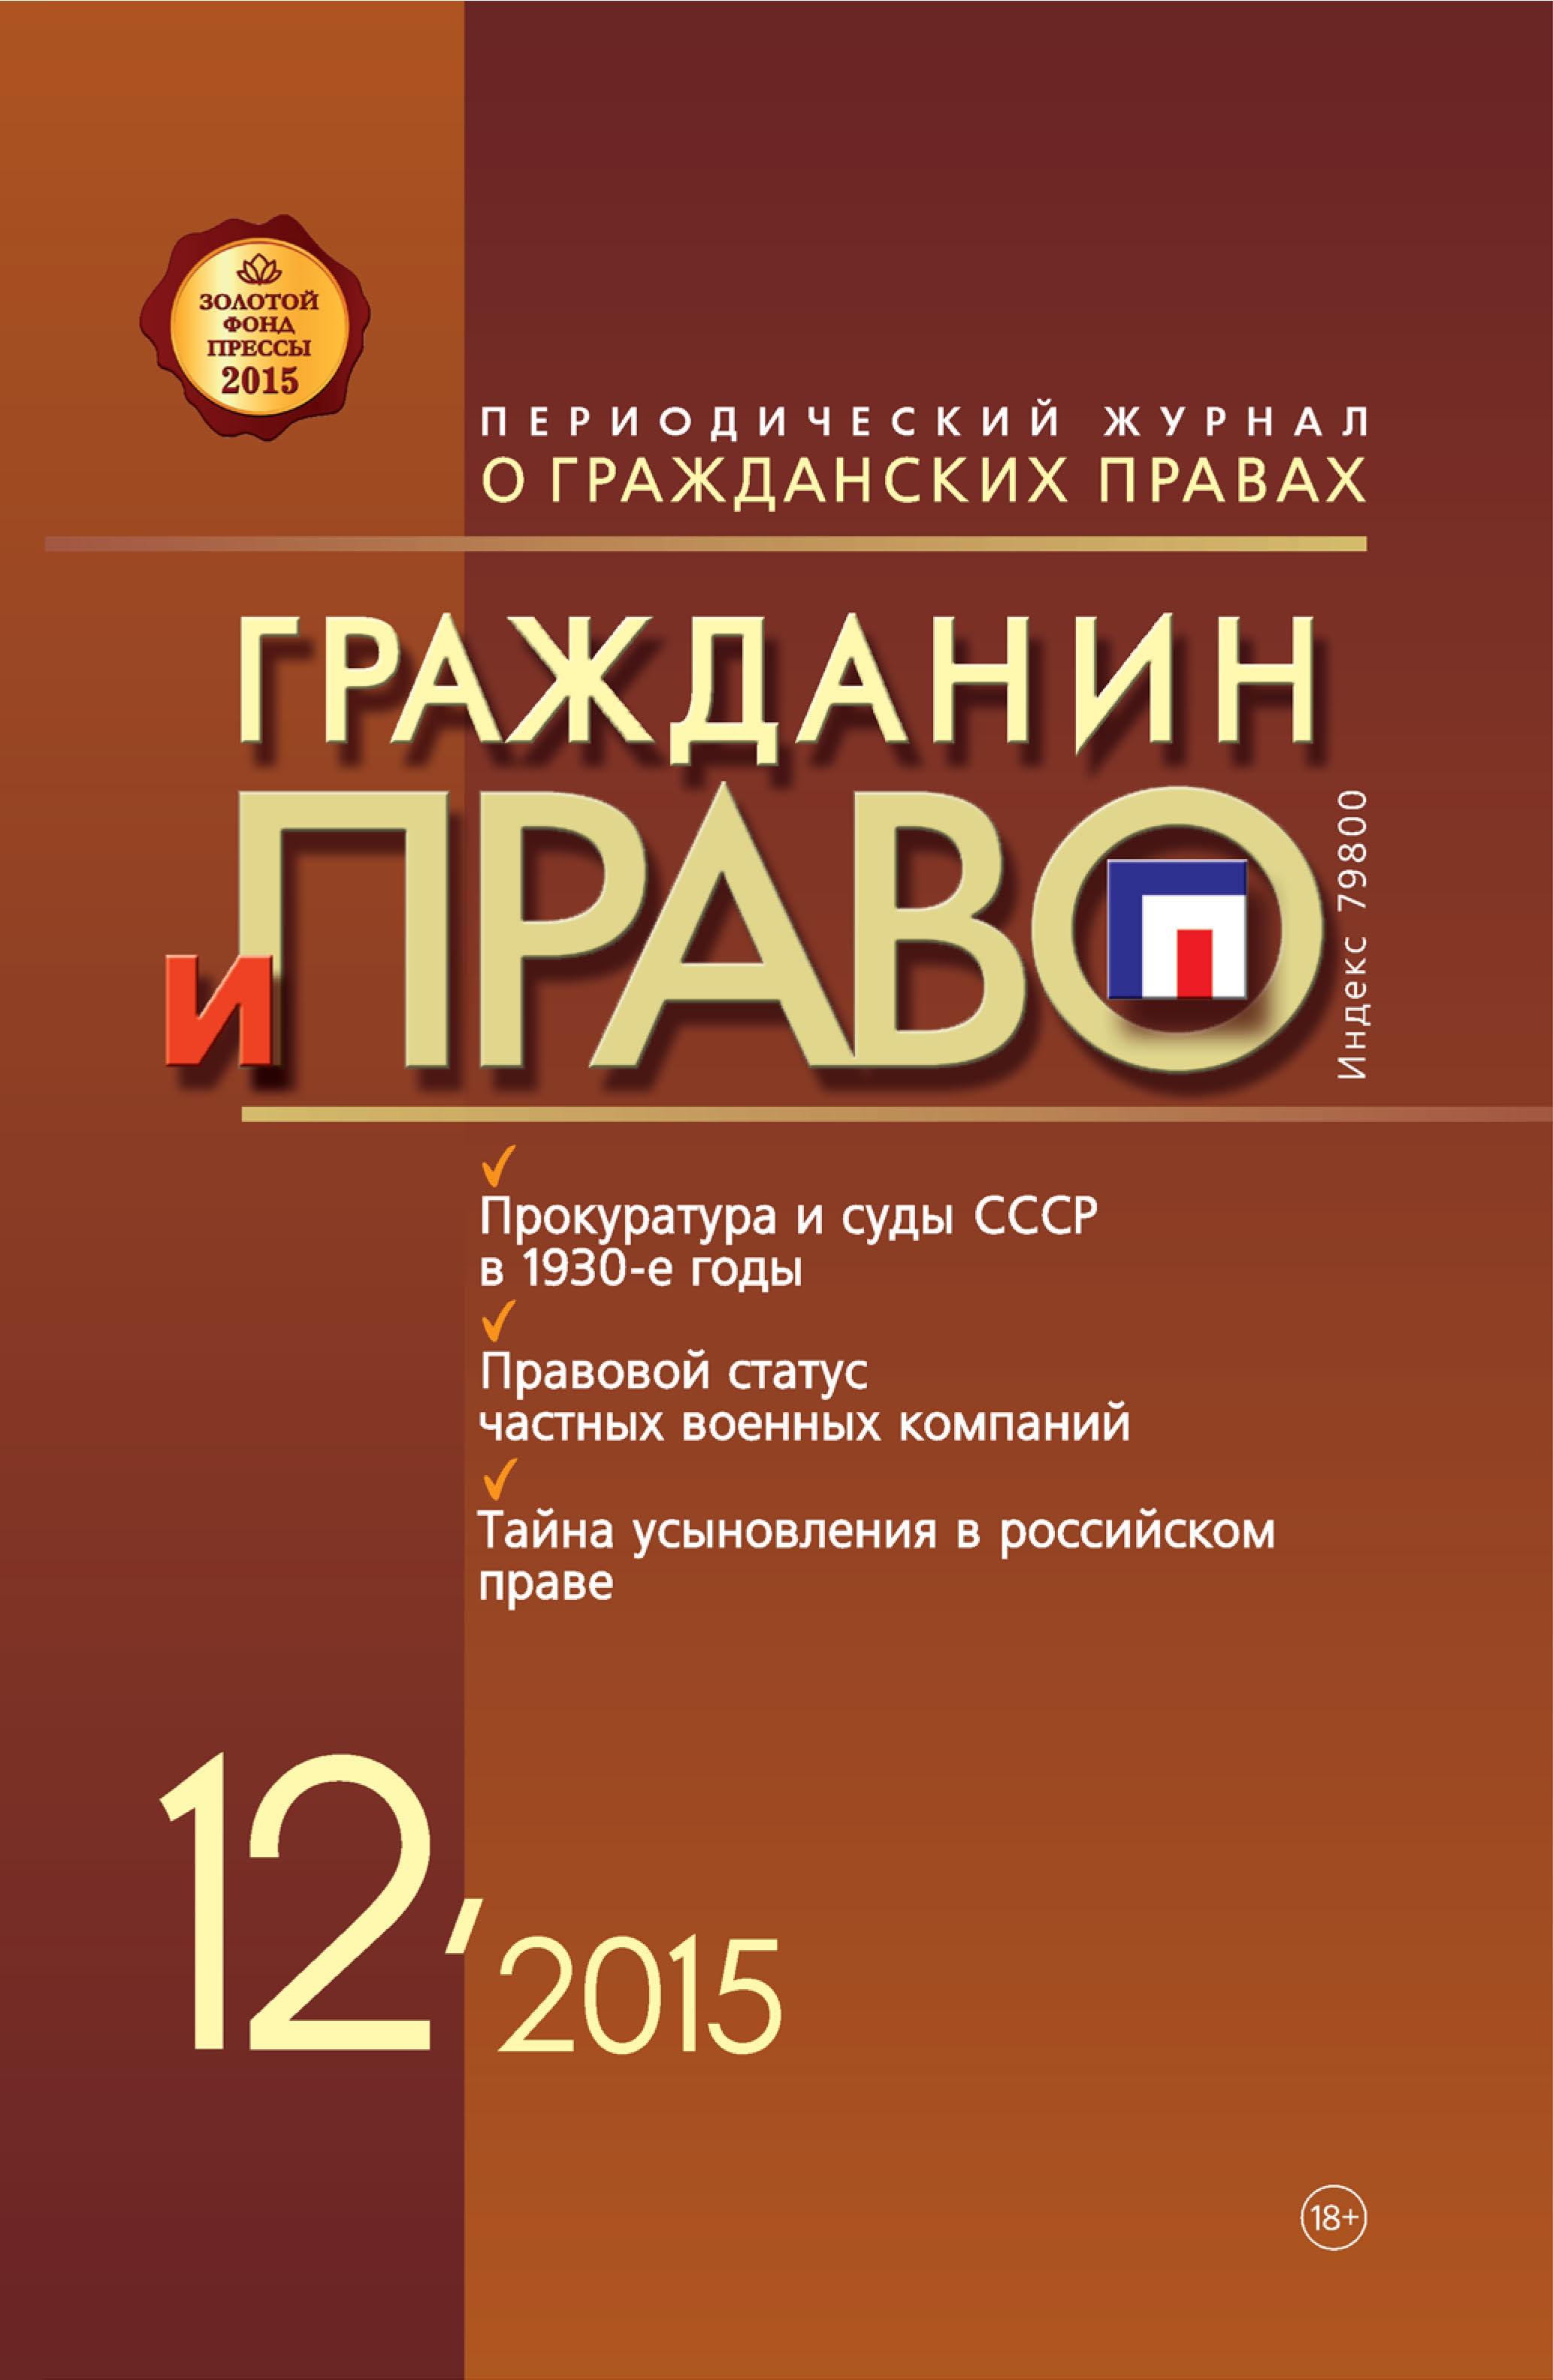 Гражданин и право №12/2015